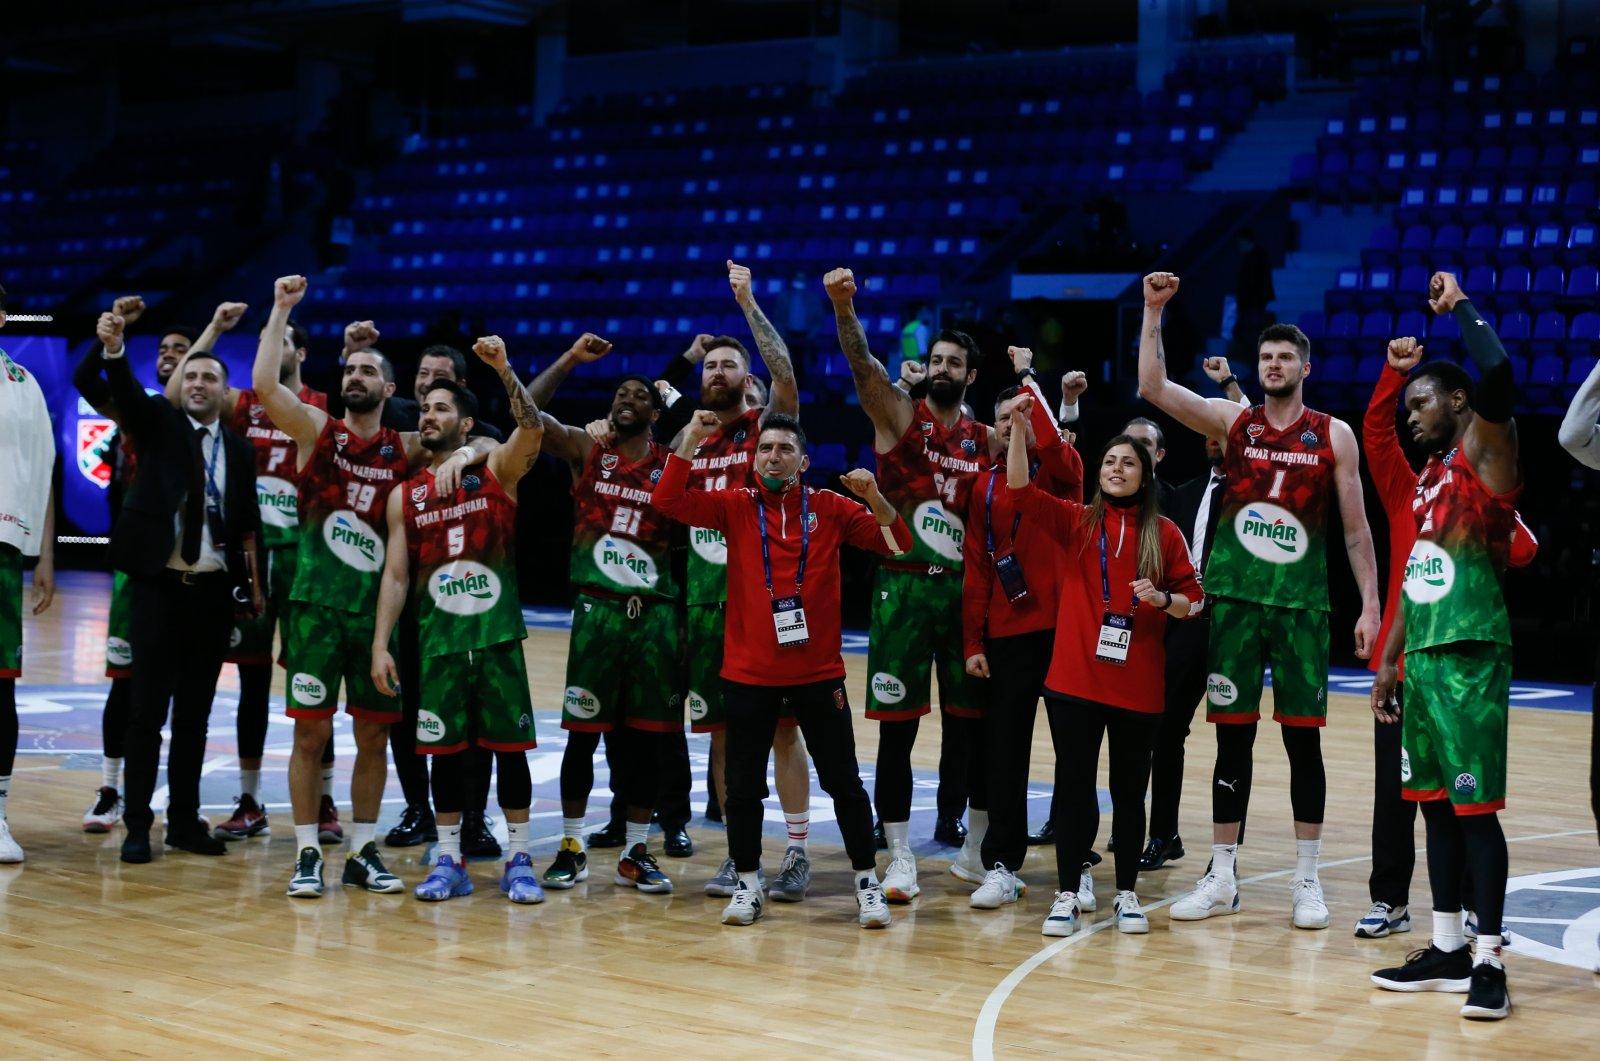 The Pınar Karşıyaka squad celebrates after its FIBA Basketball Champions League quarterfinal victory against Czech club ERA Nymburk at the Entertainment Complex Nagorny in Nizhny Novgorod, Russia, May 5, 2021. (AA Photo)